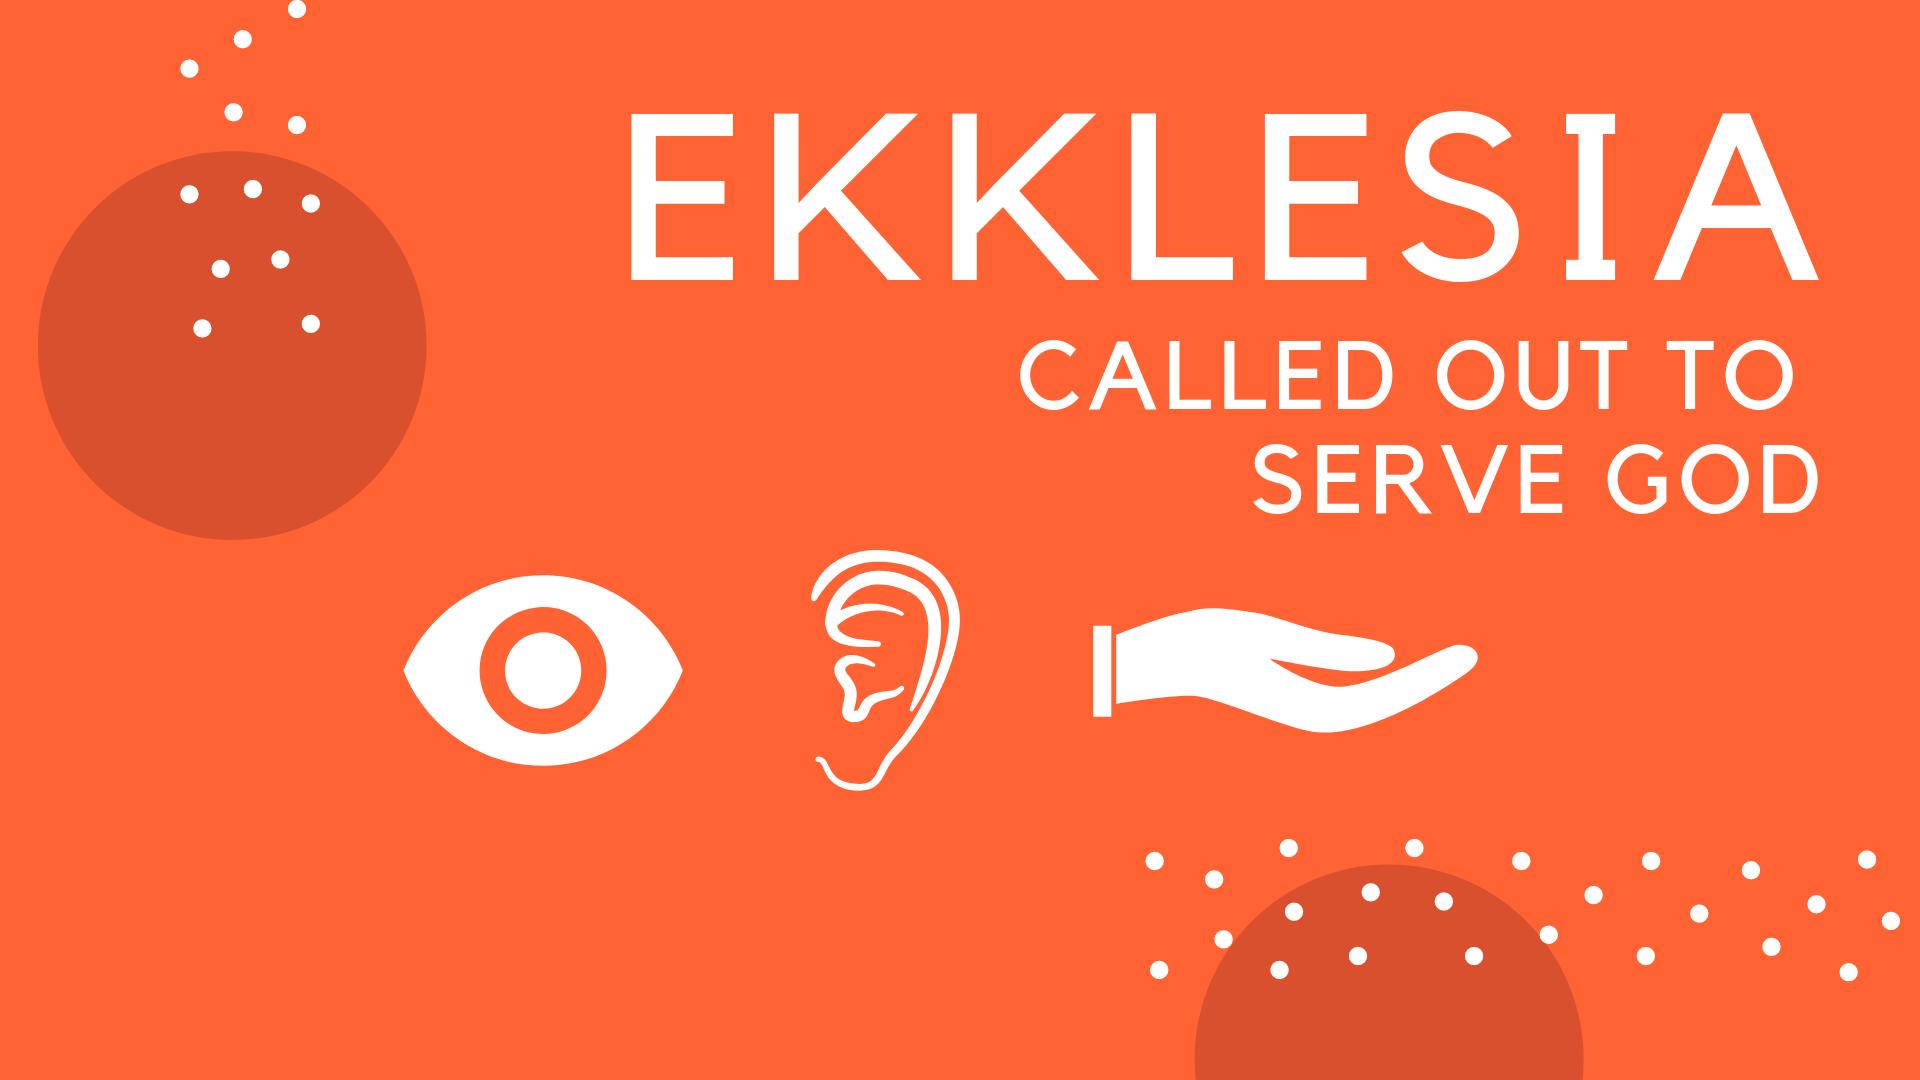 Copy of ekklesia.png